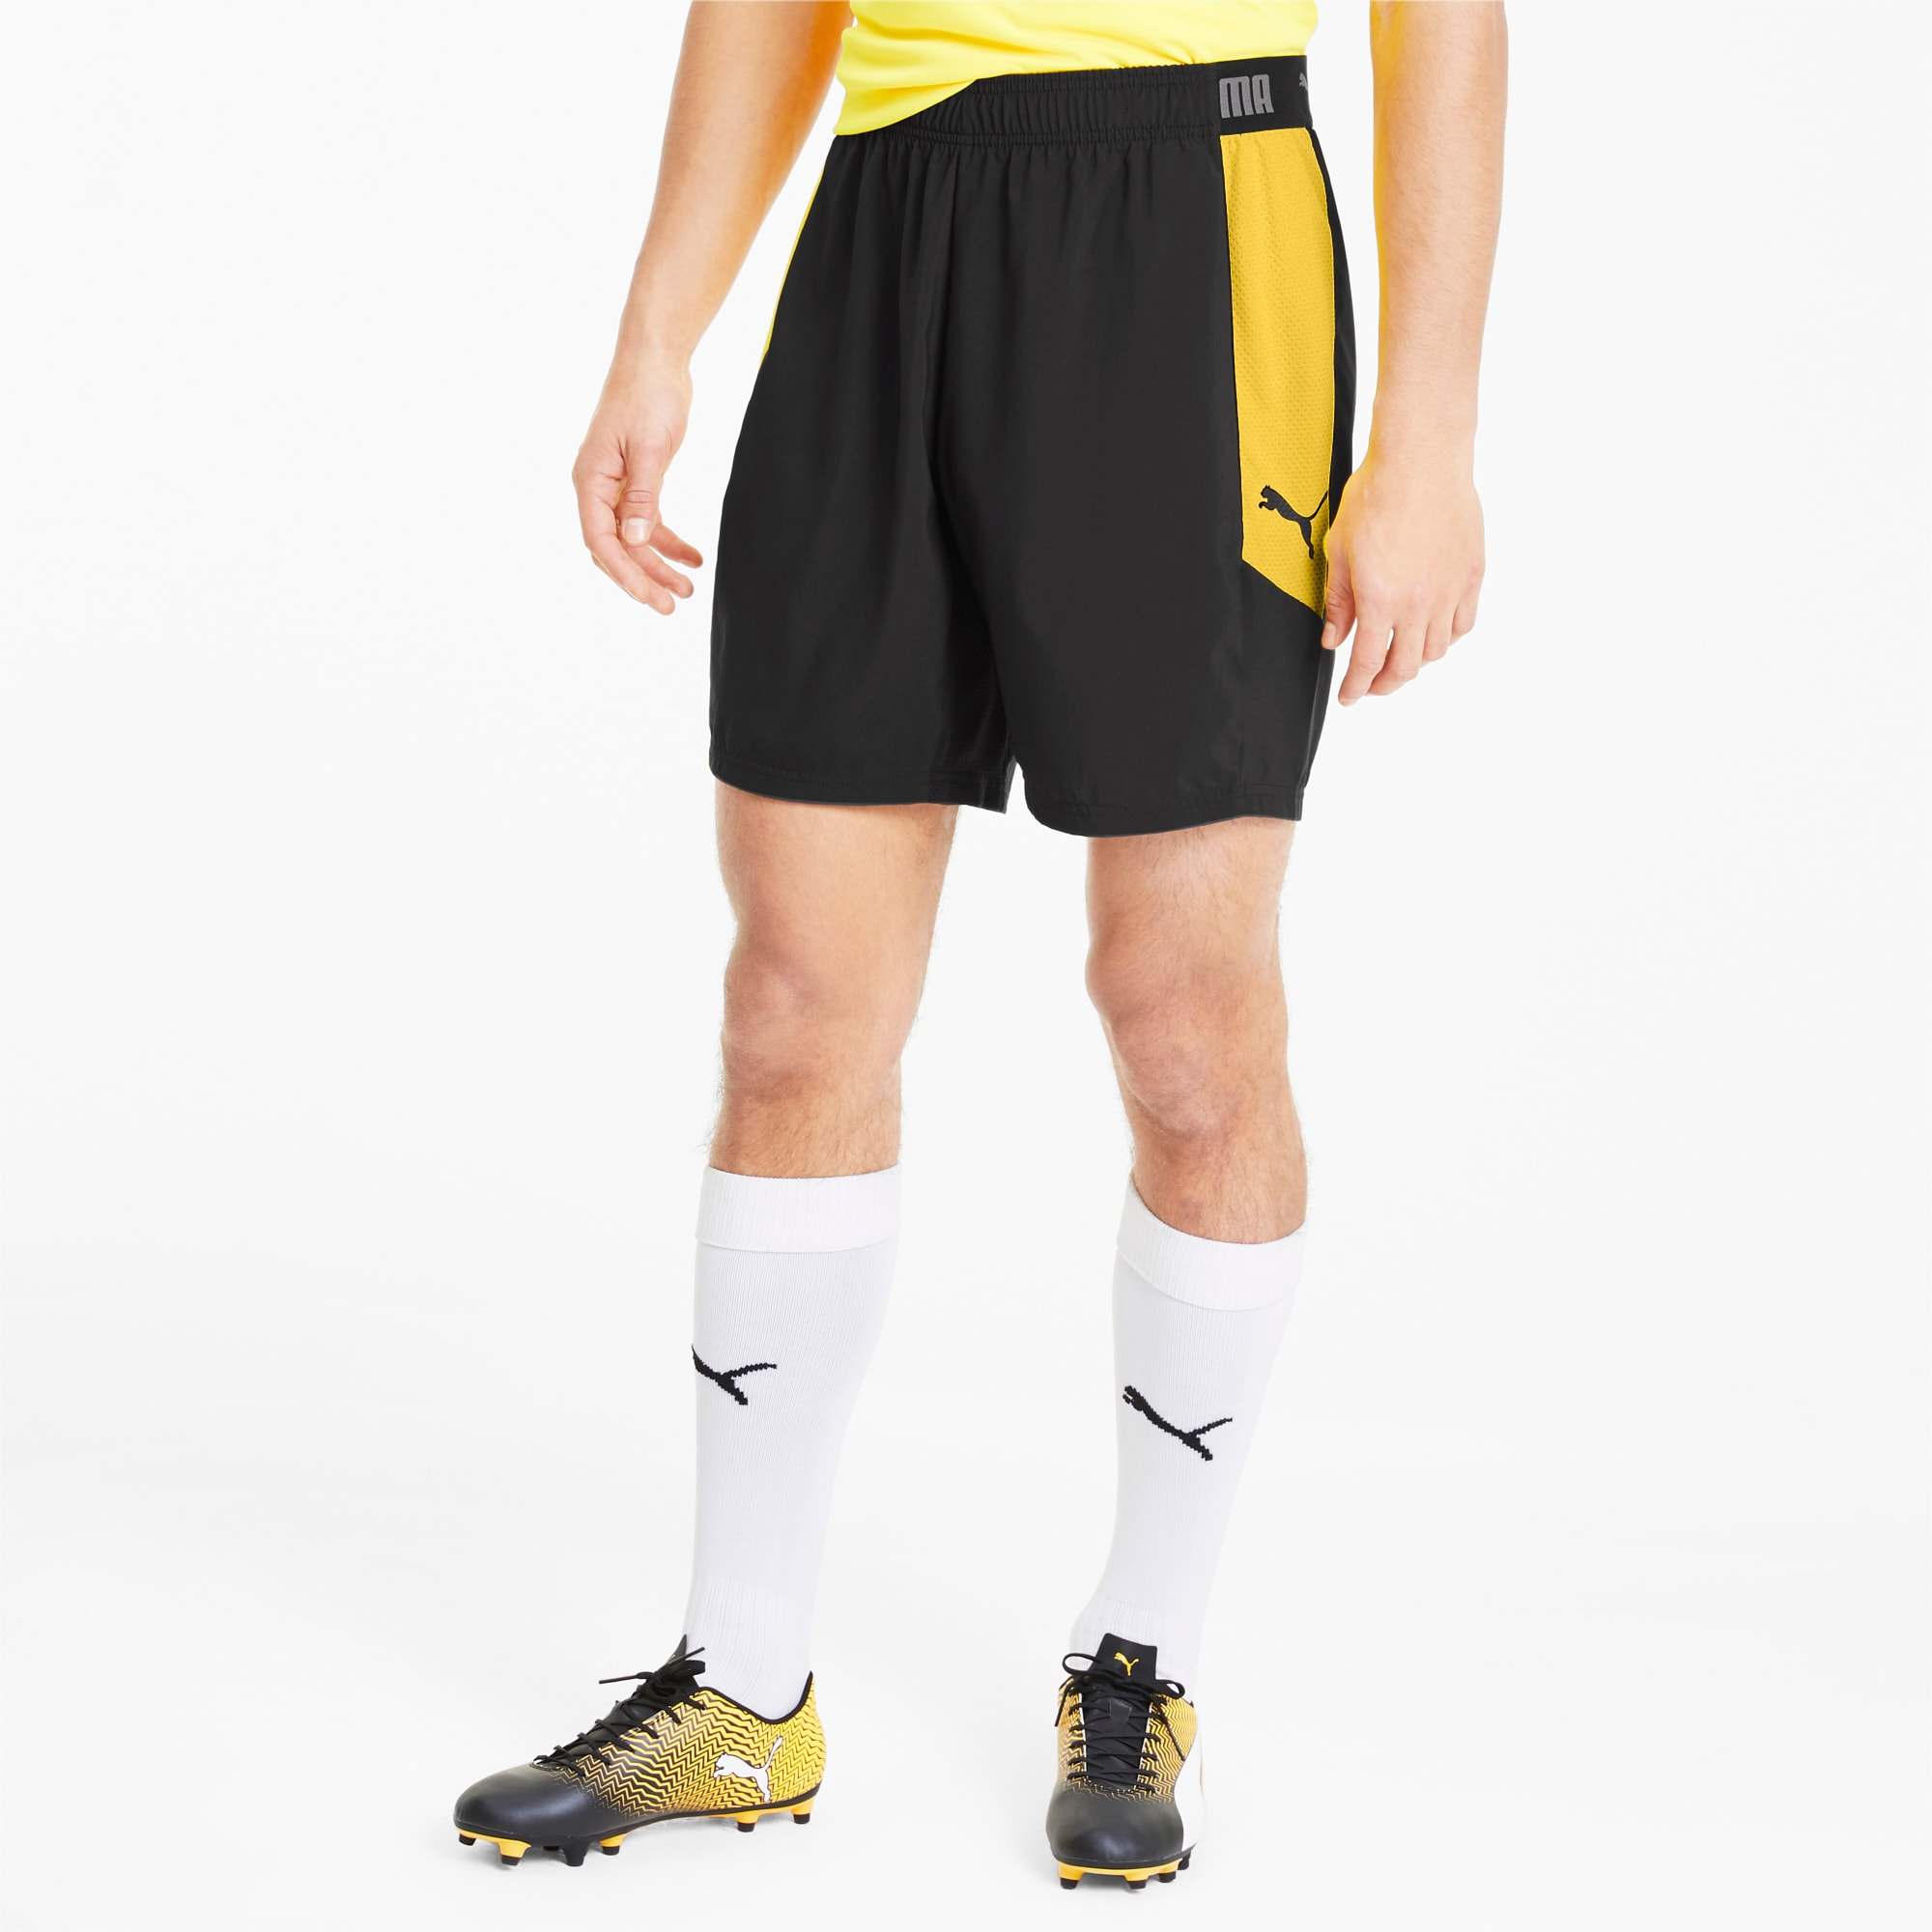 ftblNXT Men's Shorts   Puma Black   PUMA Shoes   PUMA